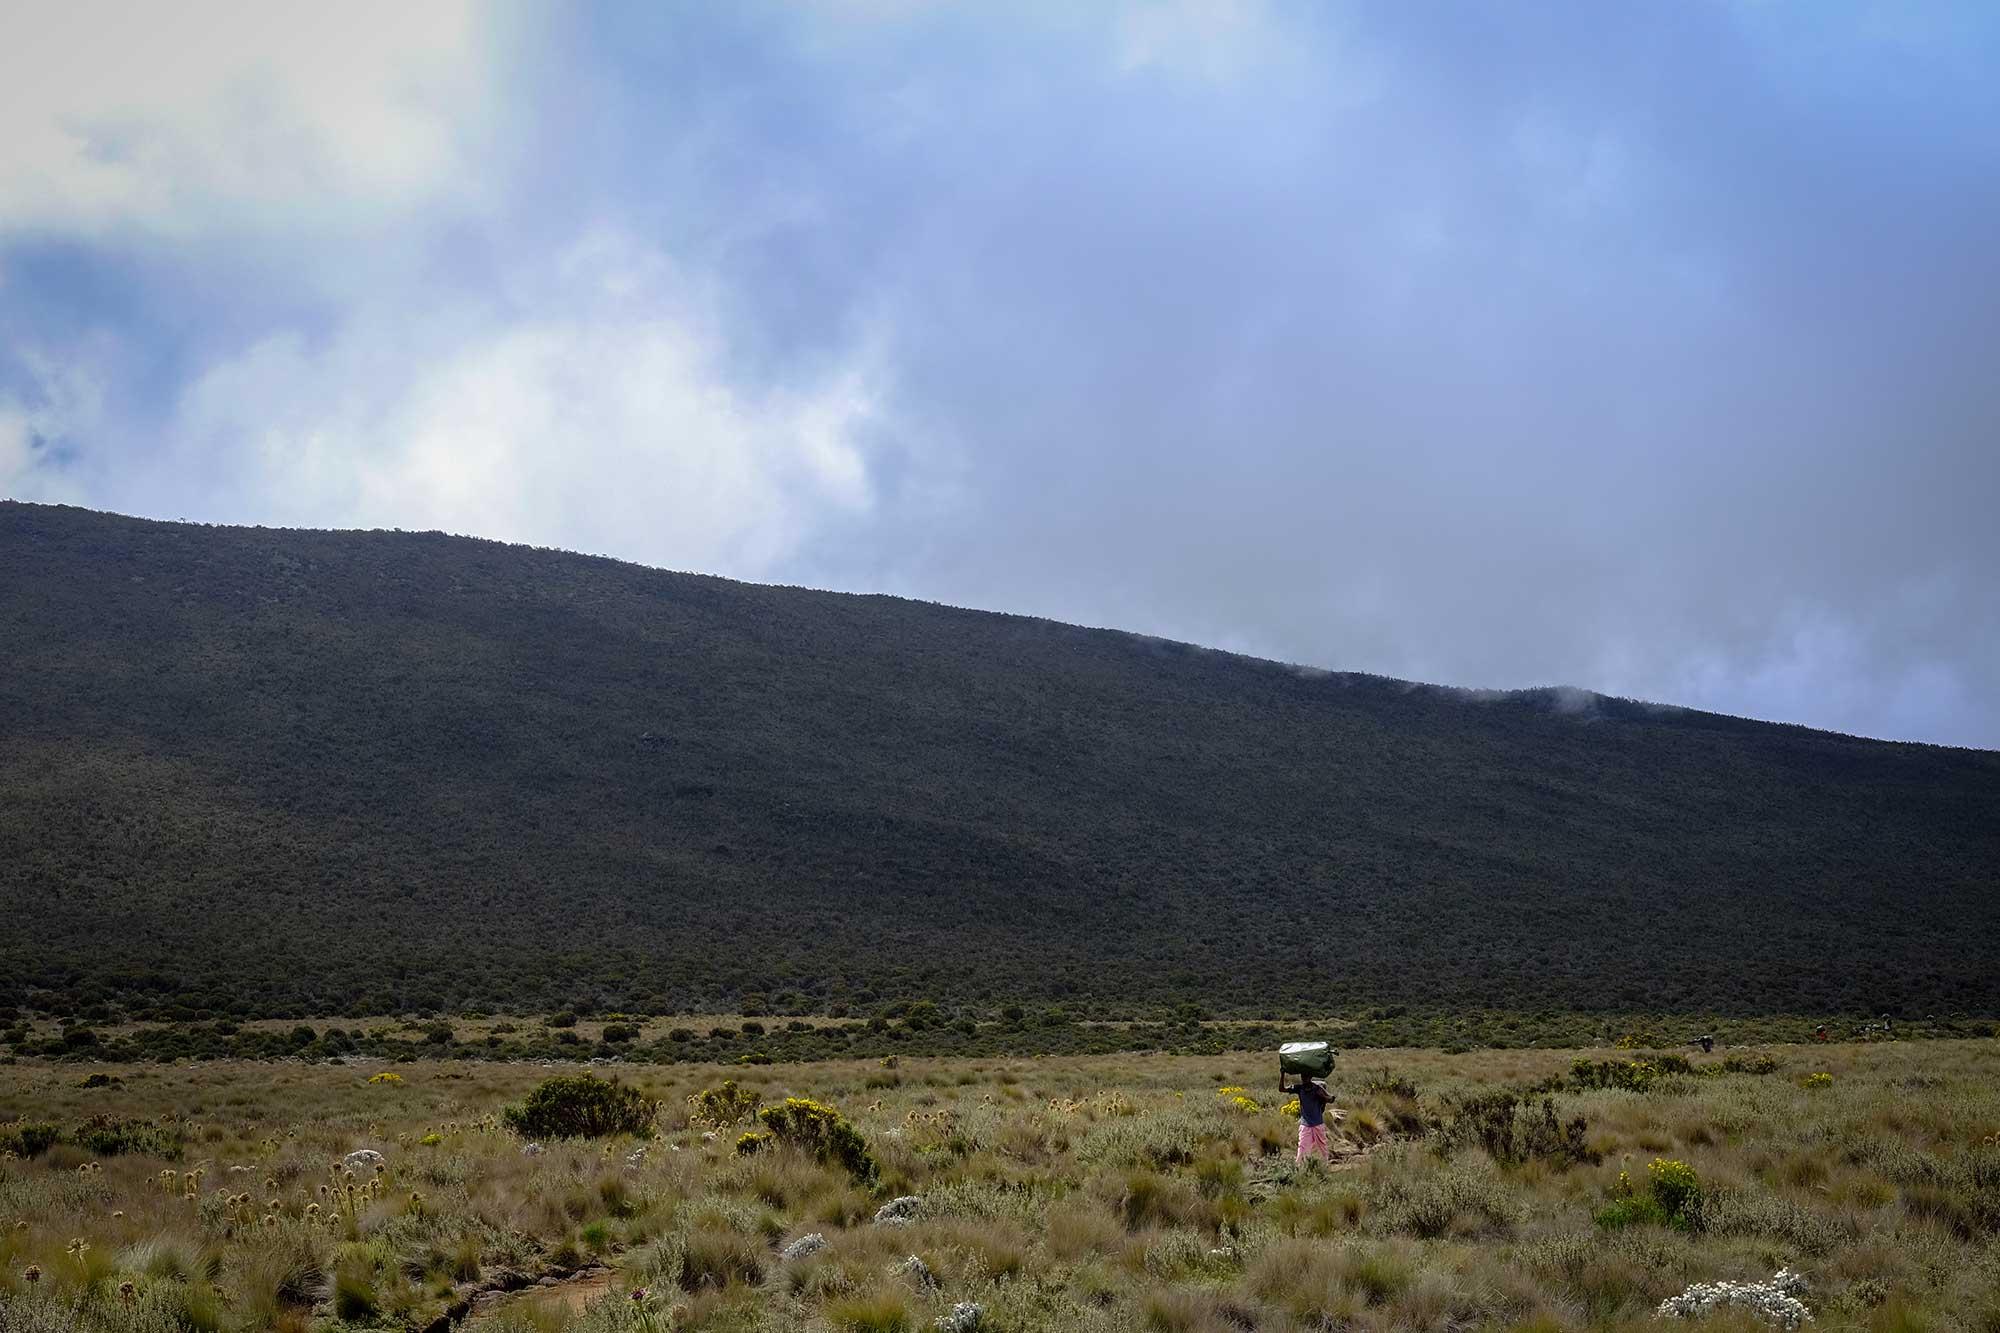 D2-29-Looking-back-from-where-we-came-shira-plateau-kilimanjaro.jpg